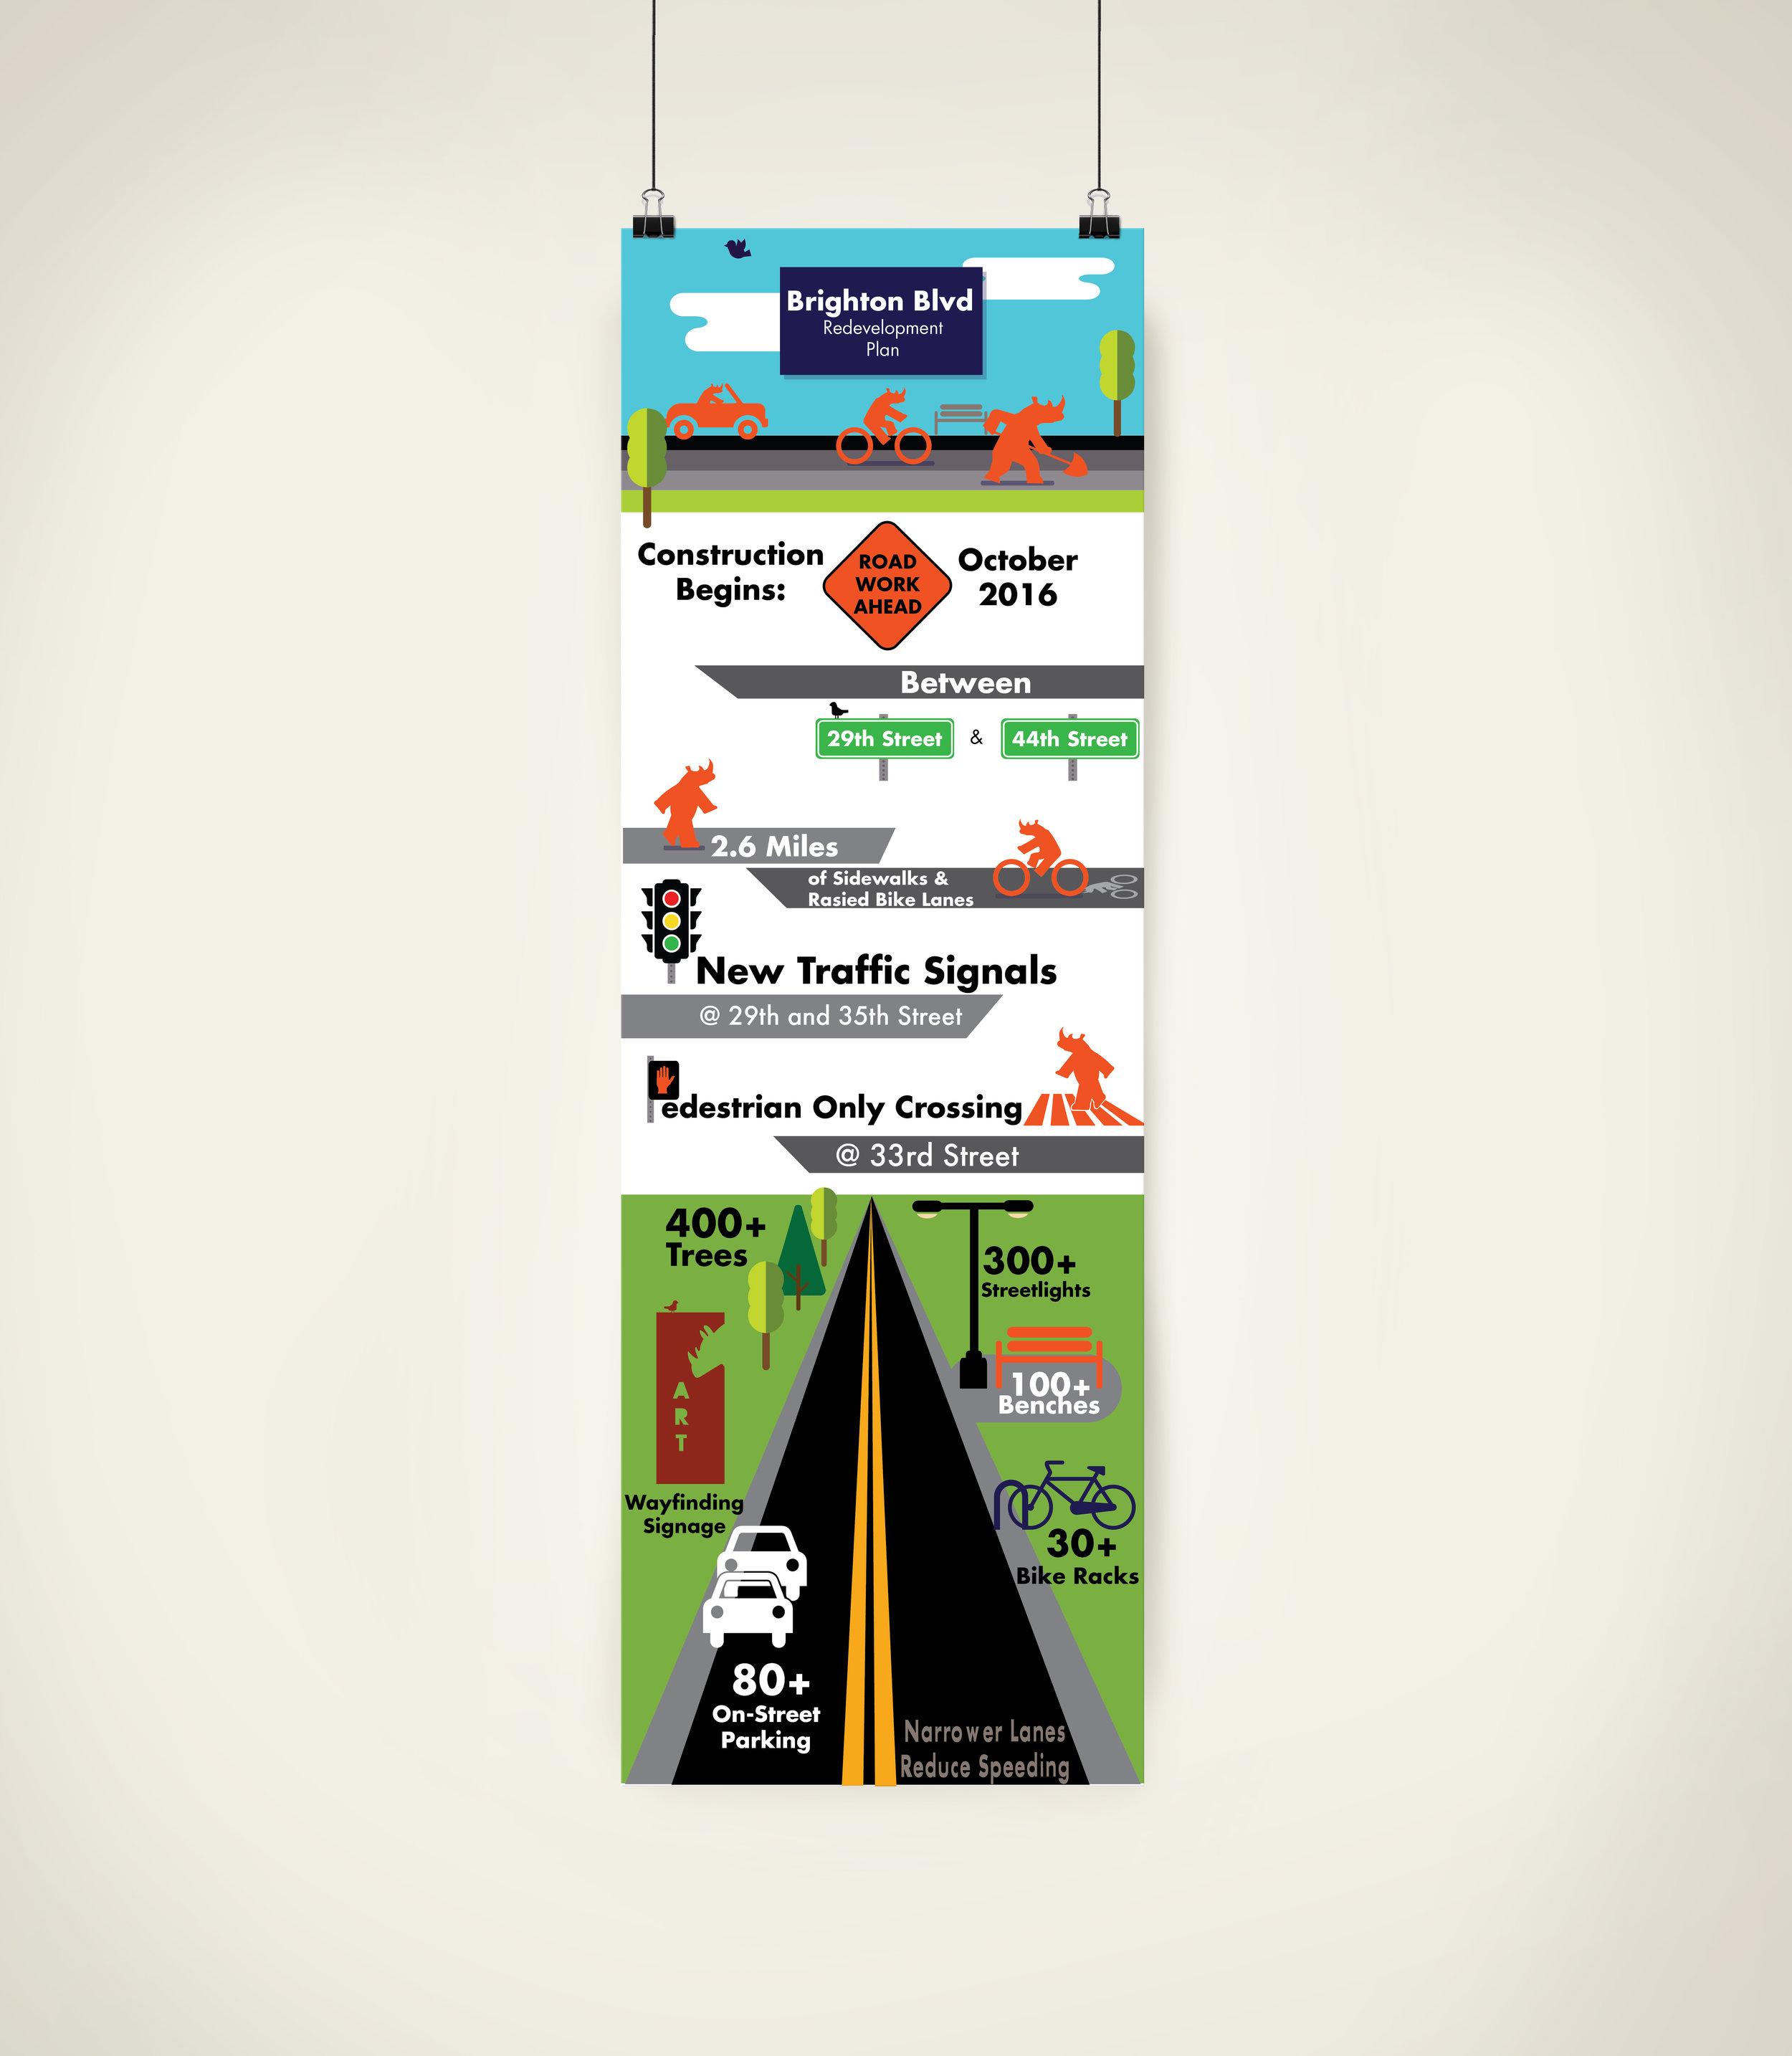 Brighton Blvd Infographic